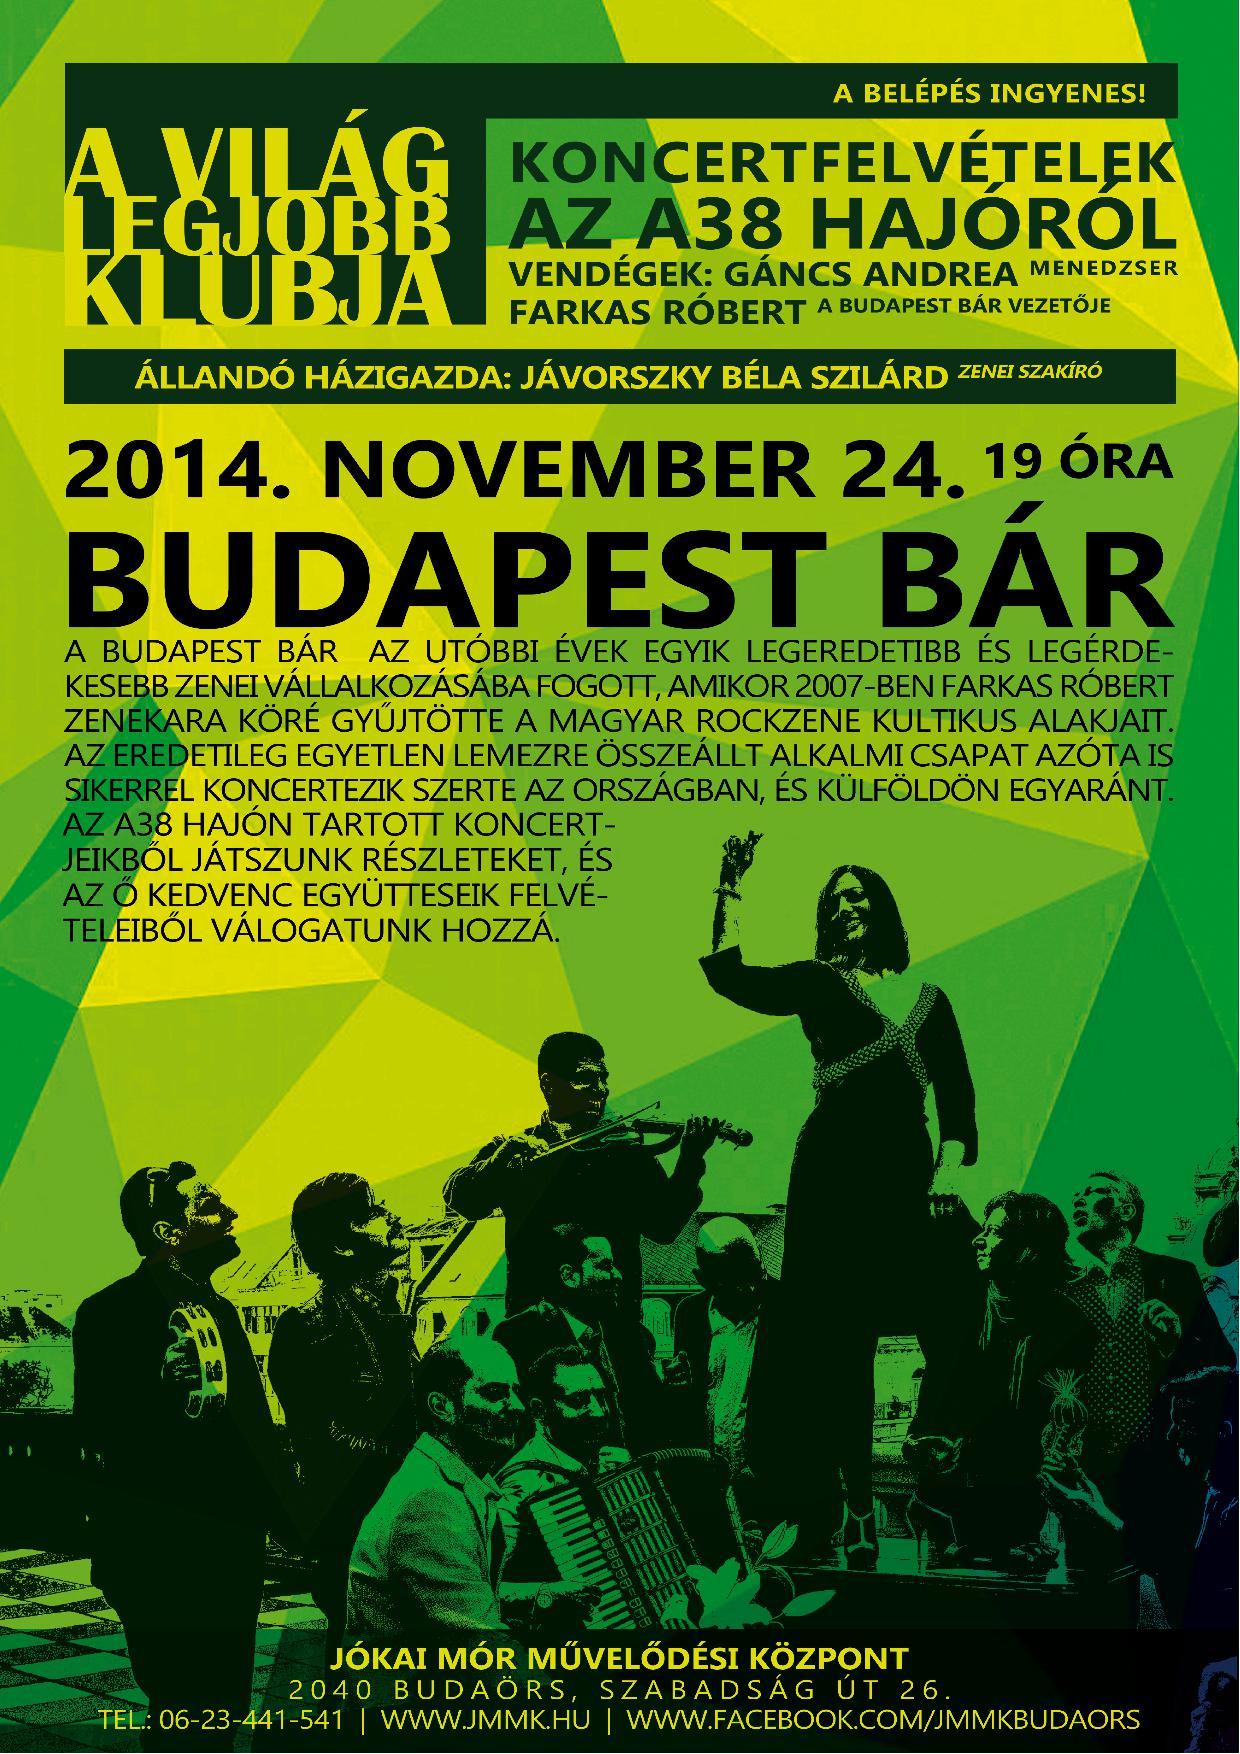 BudapestBár-plakát